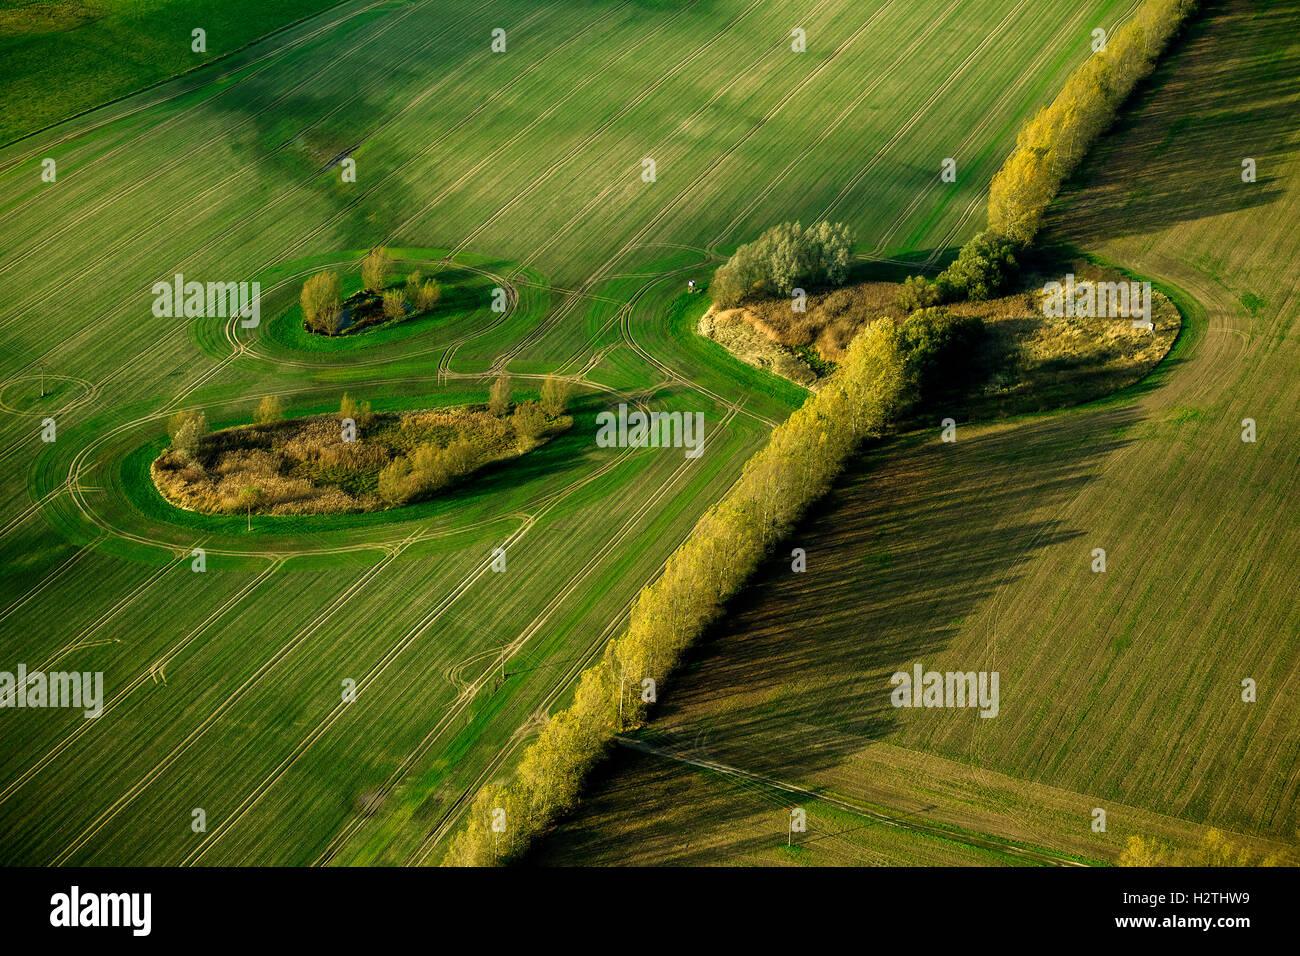 Aerial picture, bushes in the field, depression, Dargun, Müritz sea scenery, Mecklenburg-West Pomerania, Germany, - Stock Image